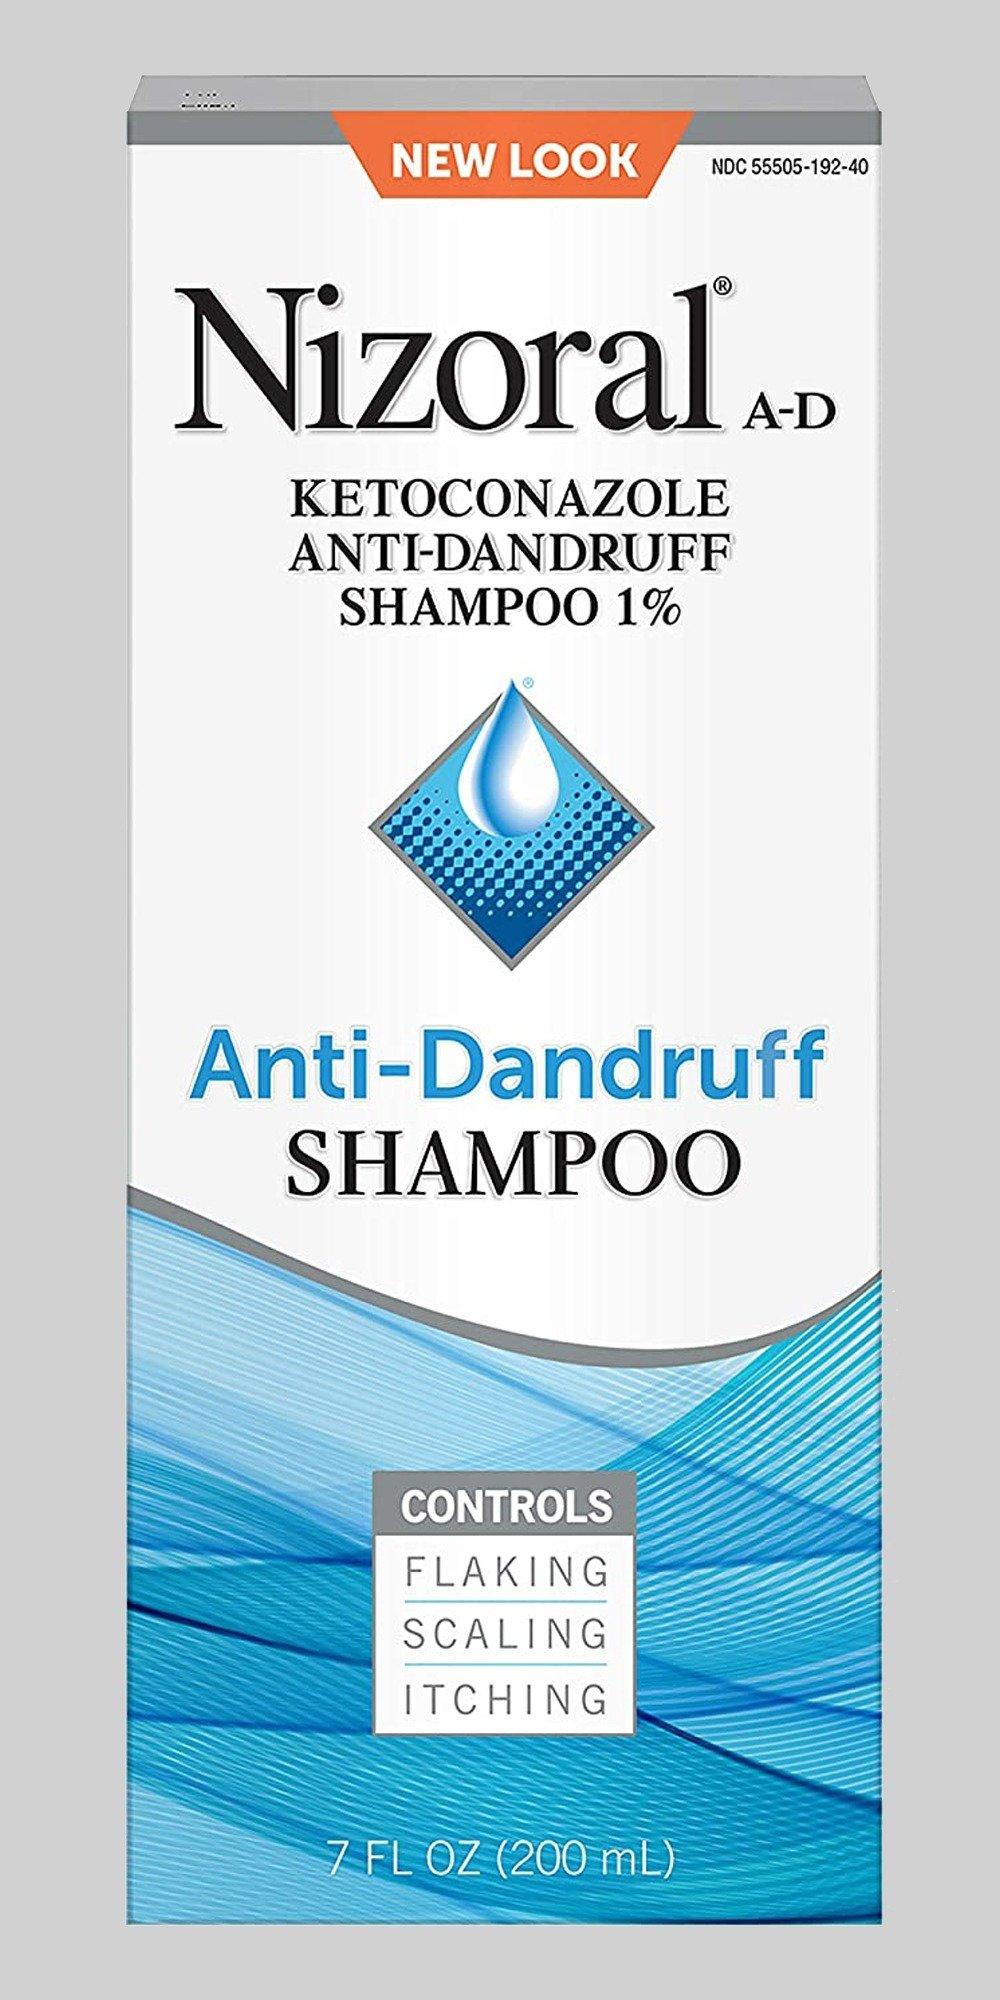 Nizoral A-D Anti-Dandruff Shampoo hairgc